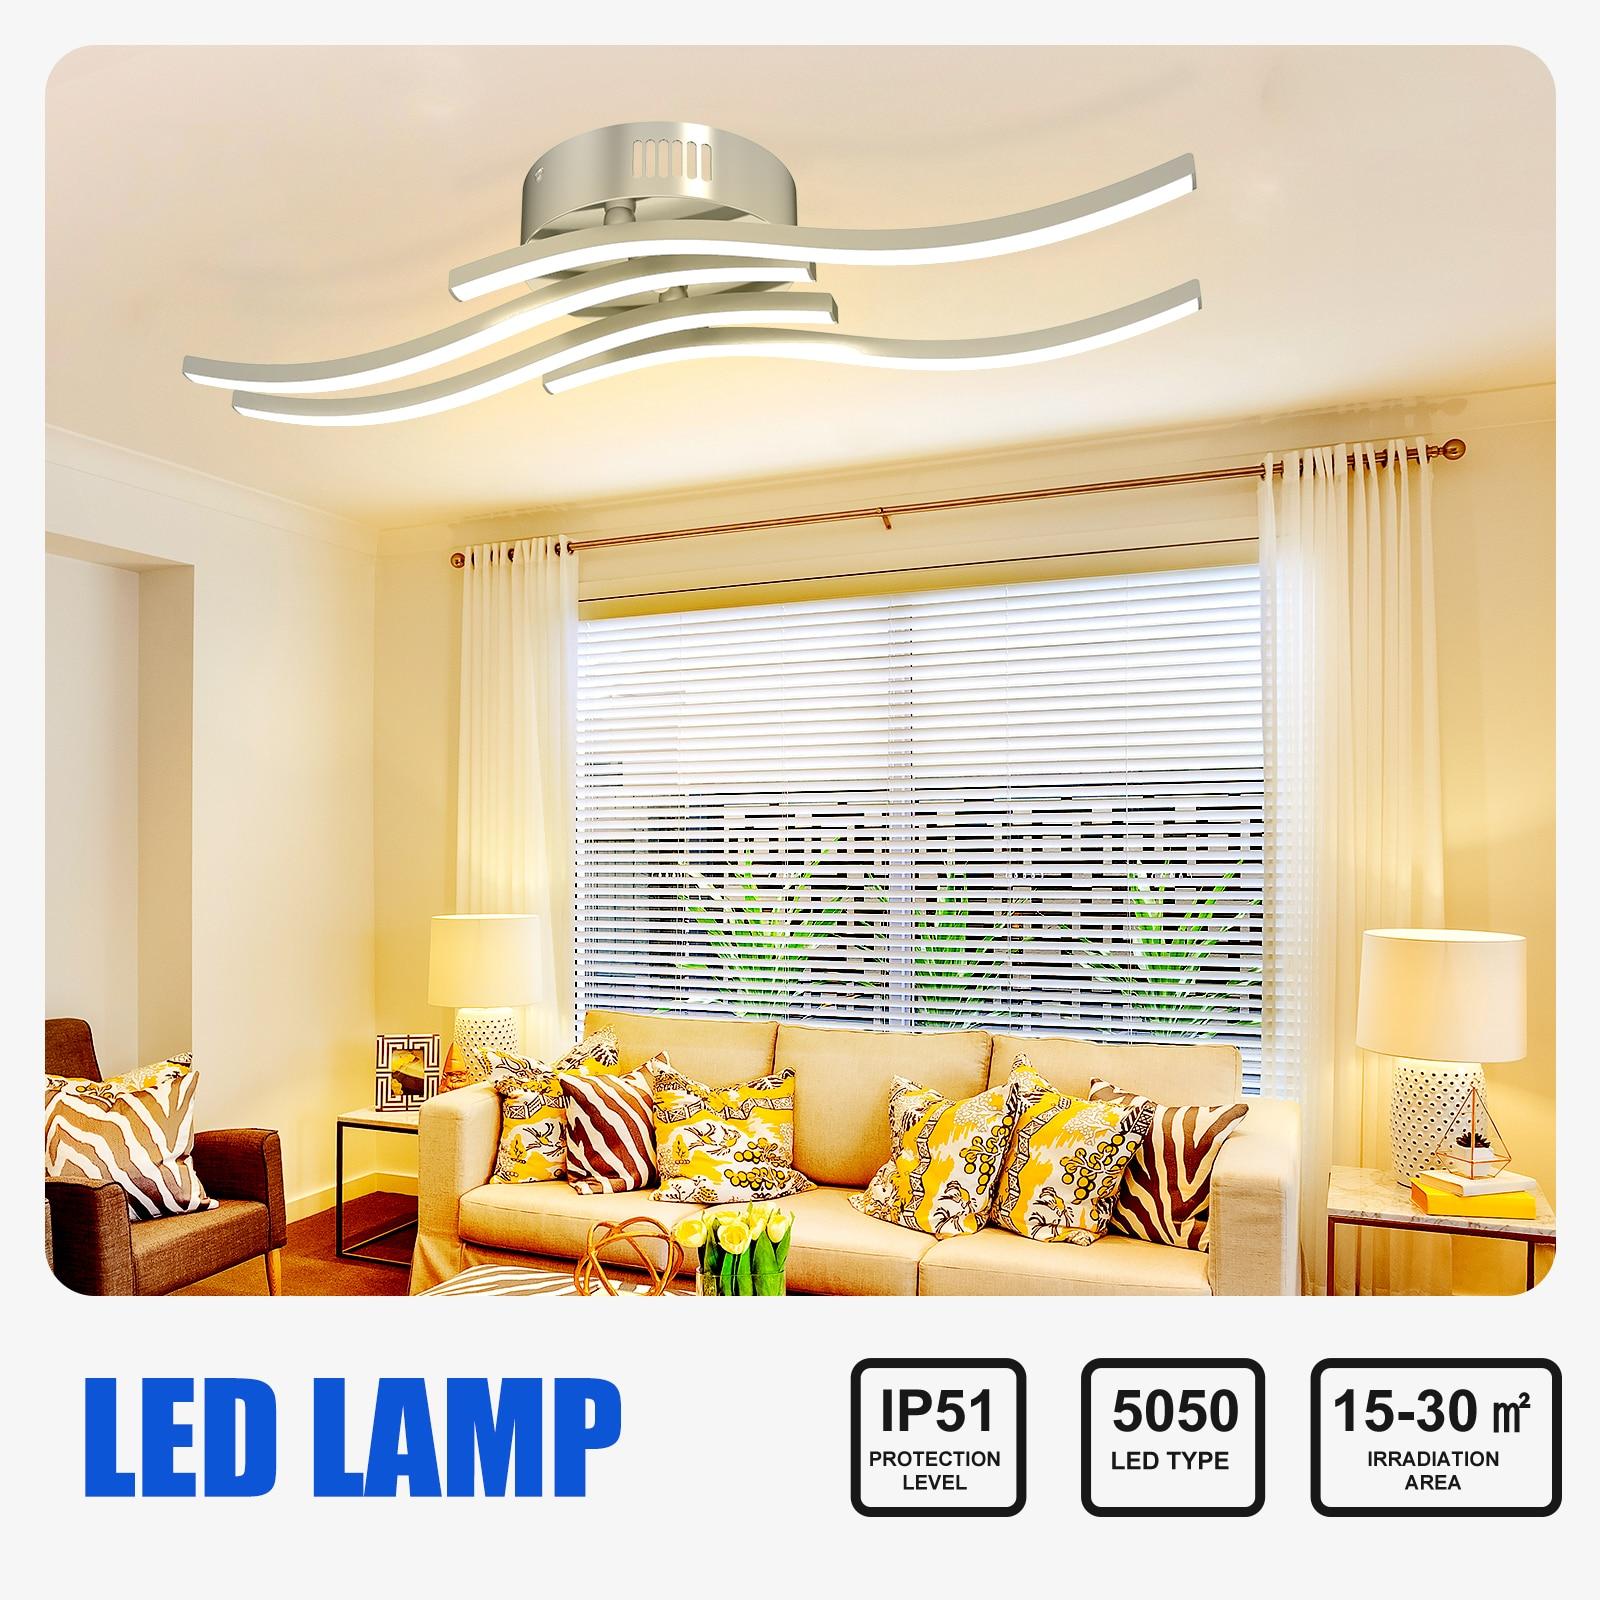 LED Ceiling Lights For Living Room 12W 18W 24W Warm Cold White Modern Design Lighting Lamp Bedroom Decoration Furnitur Dining